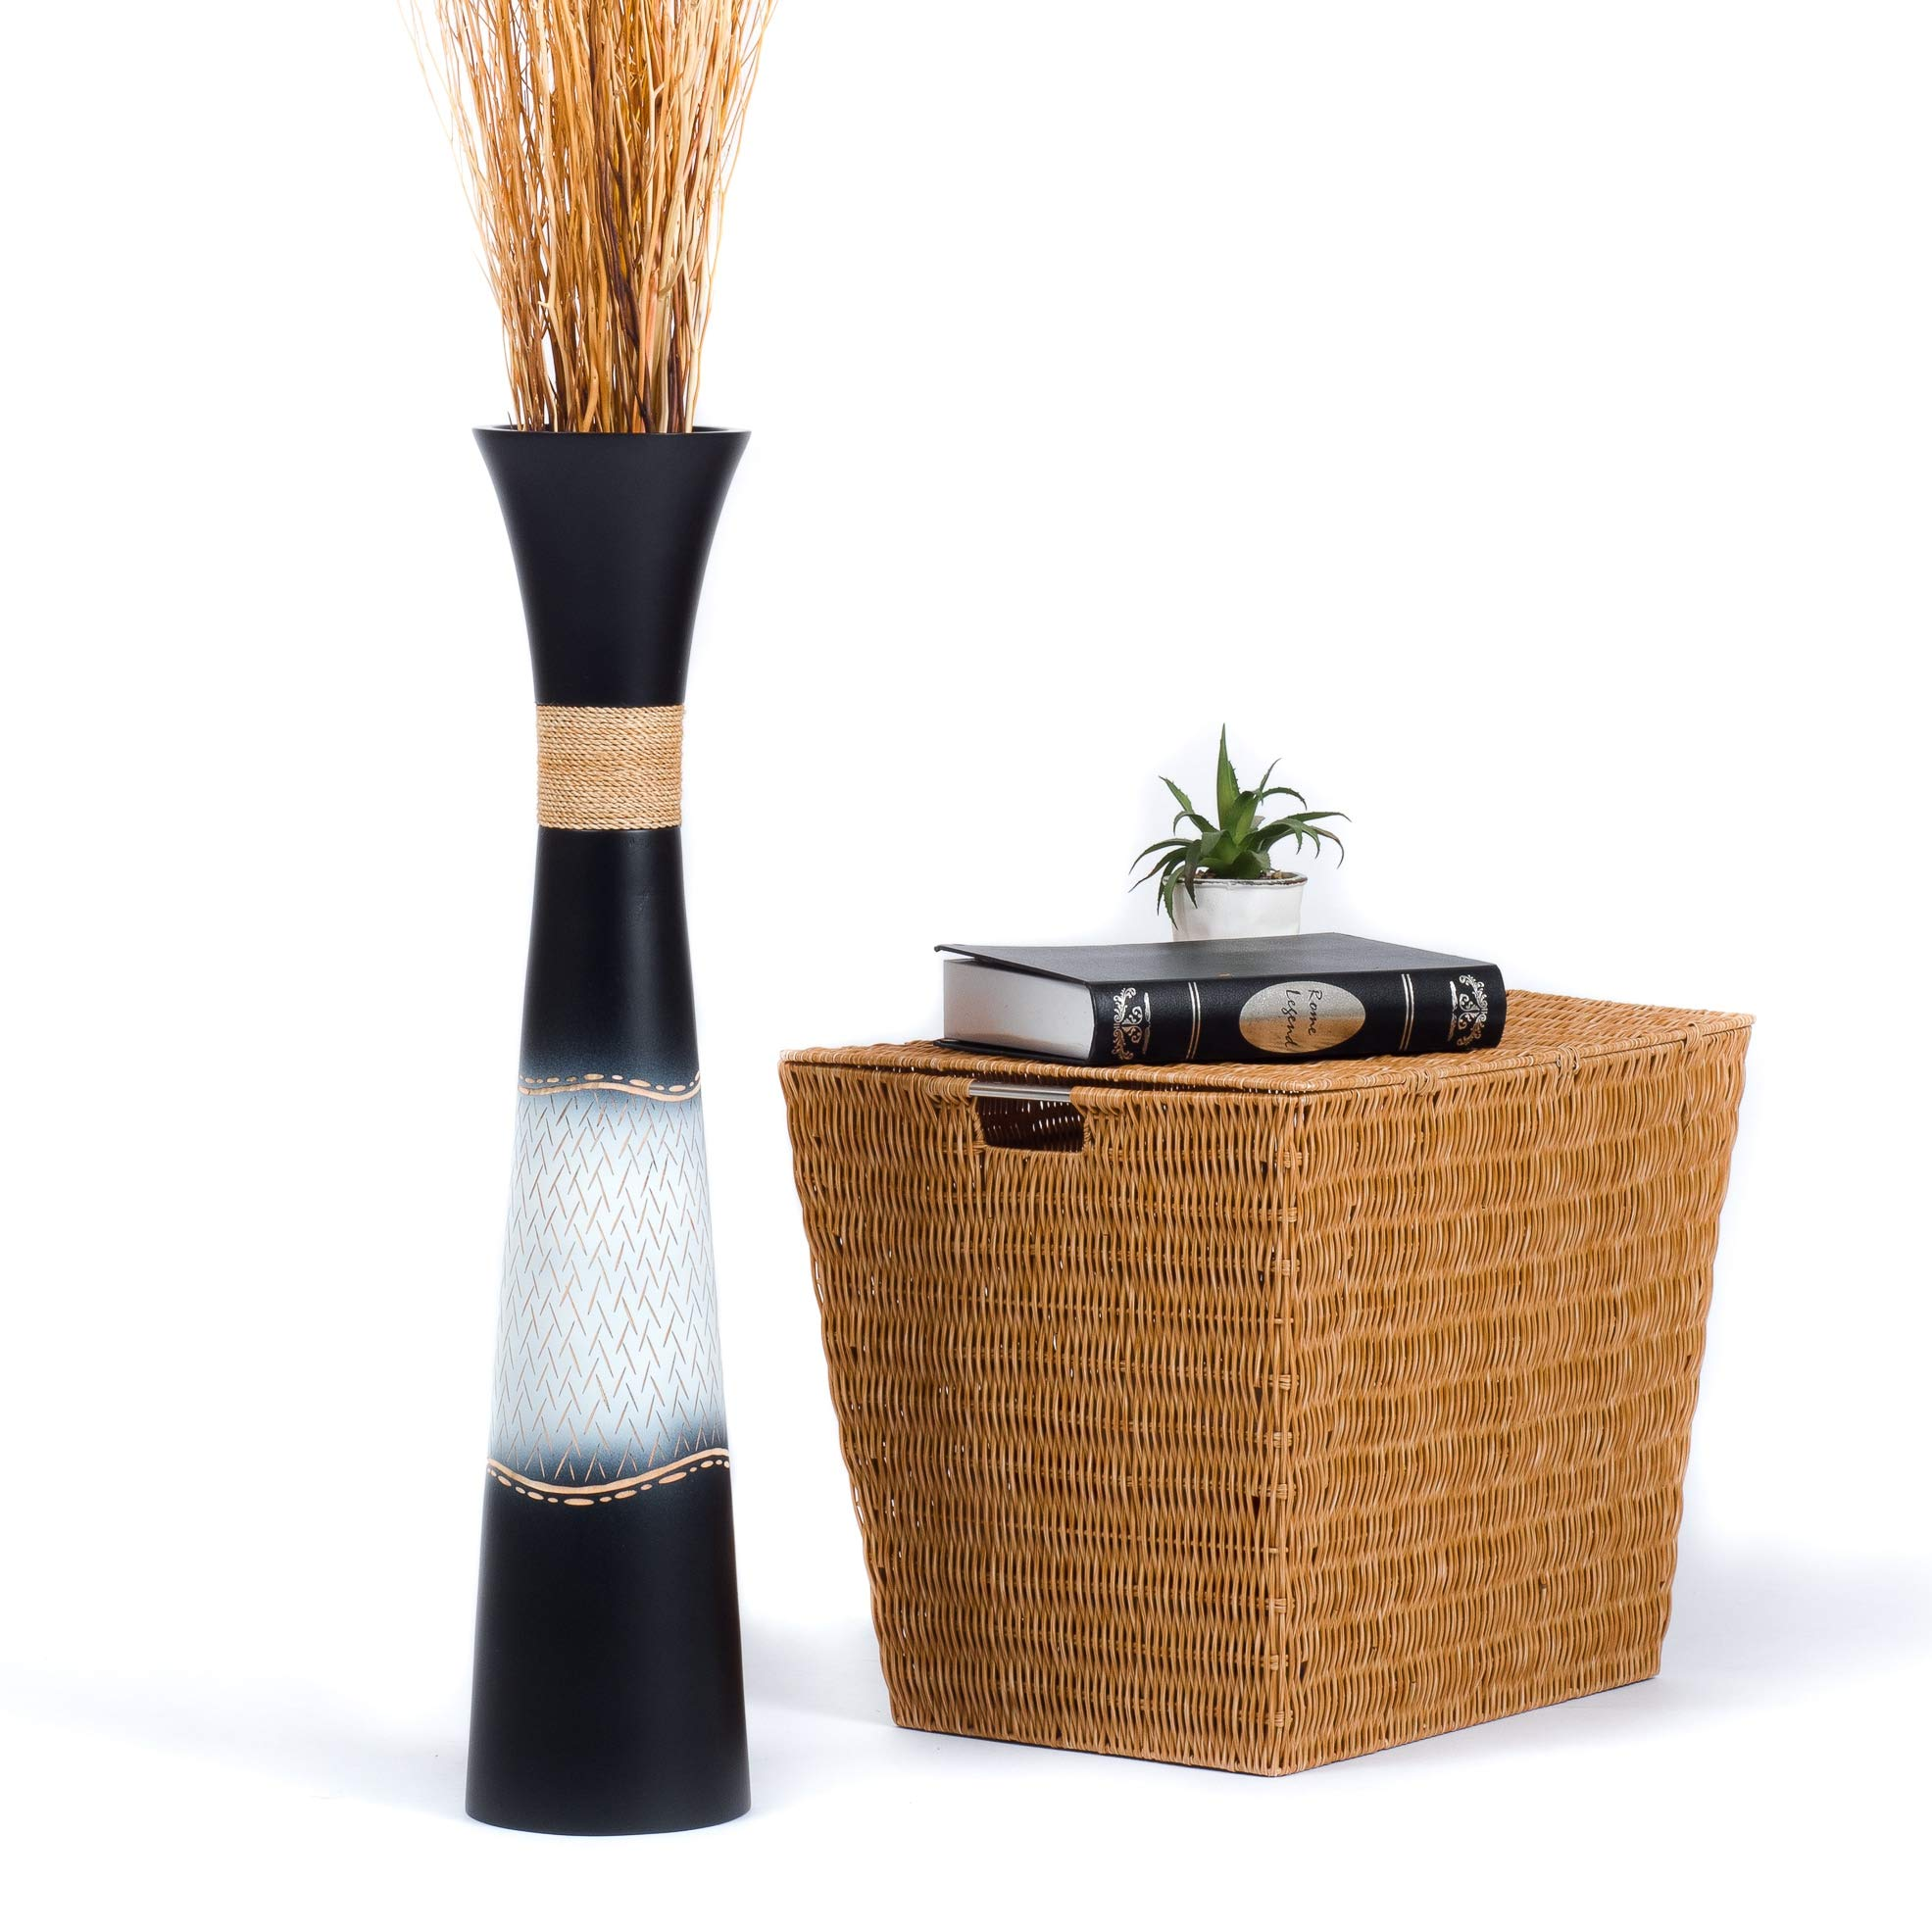 Leewadee Tall Big Floor Standing Vase for Home Decor 10 cm, Mango Wood,  Black White